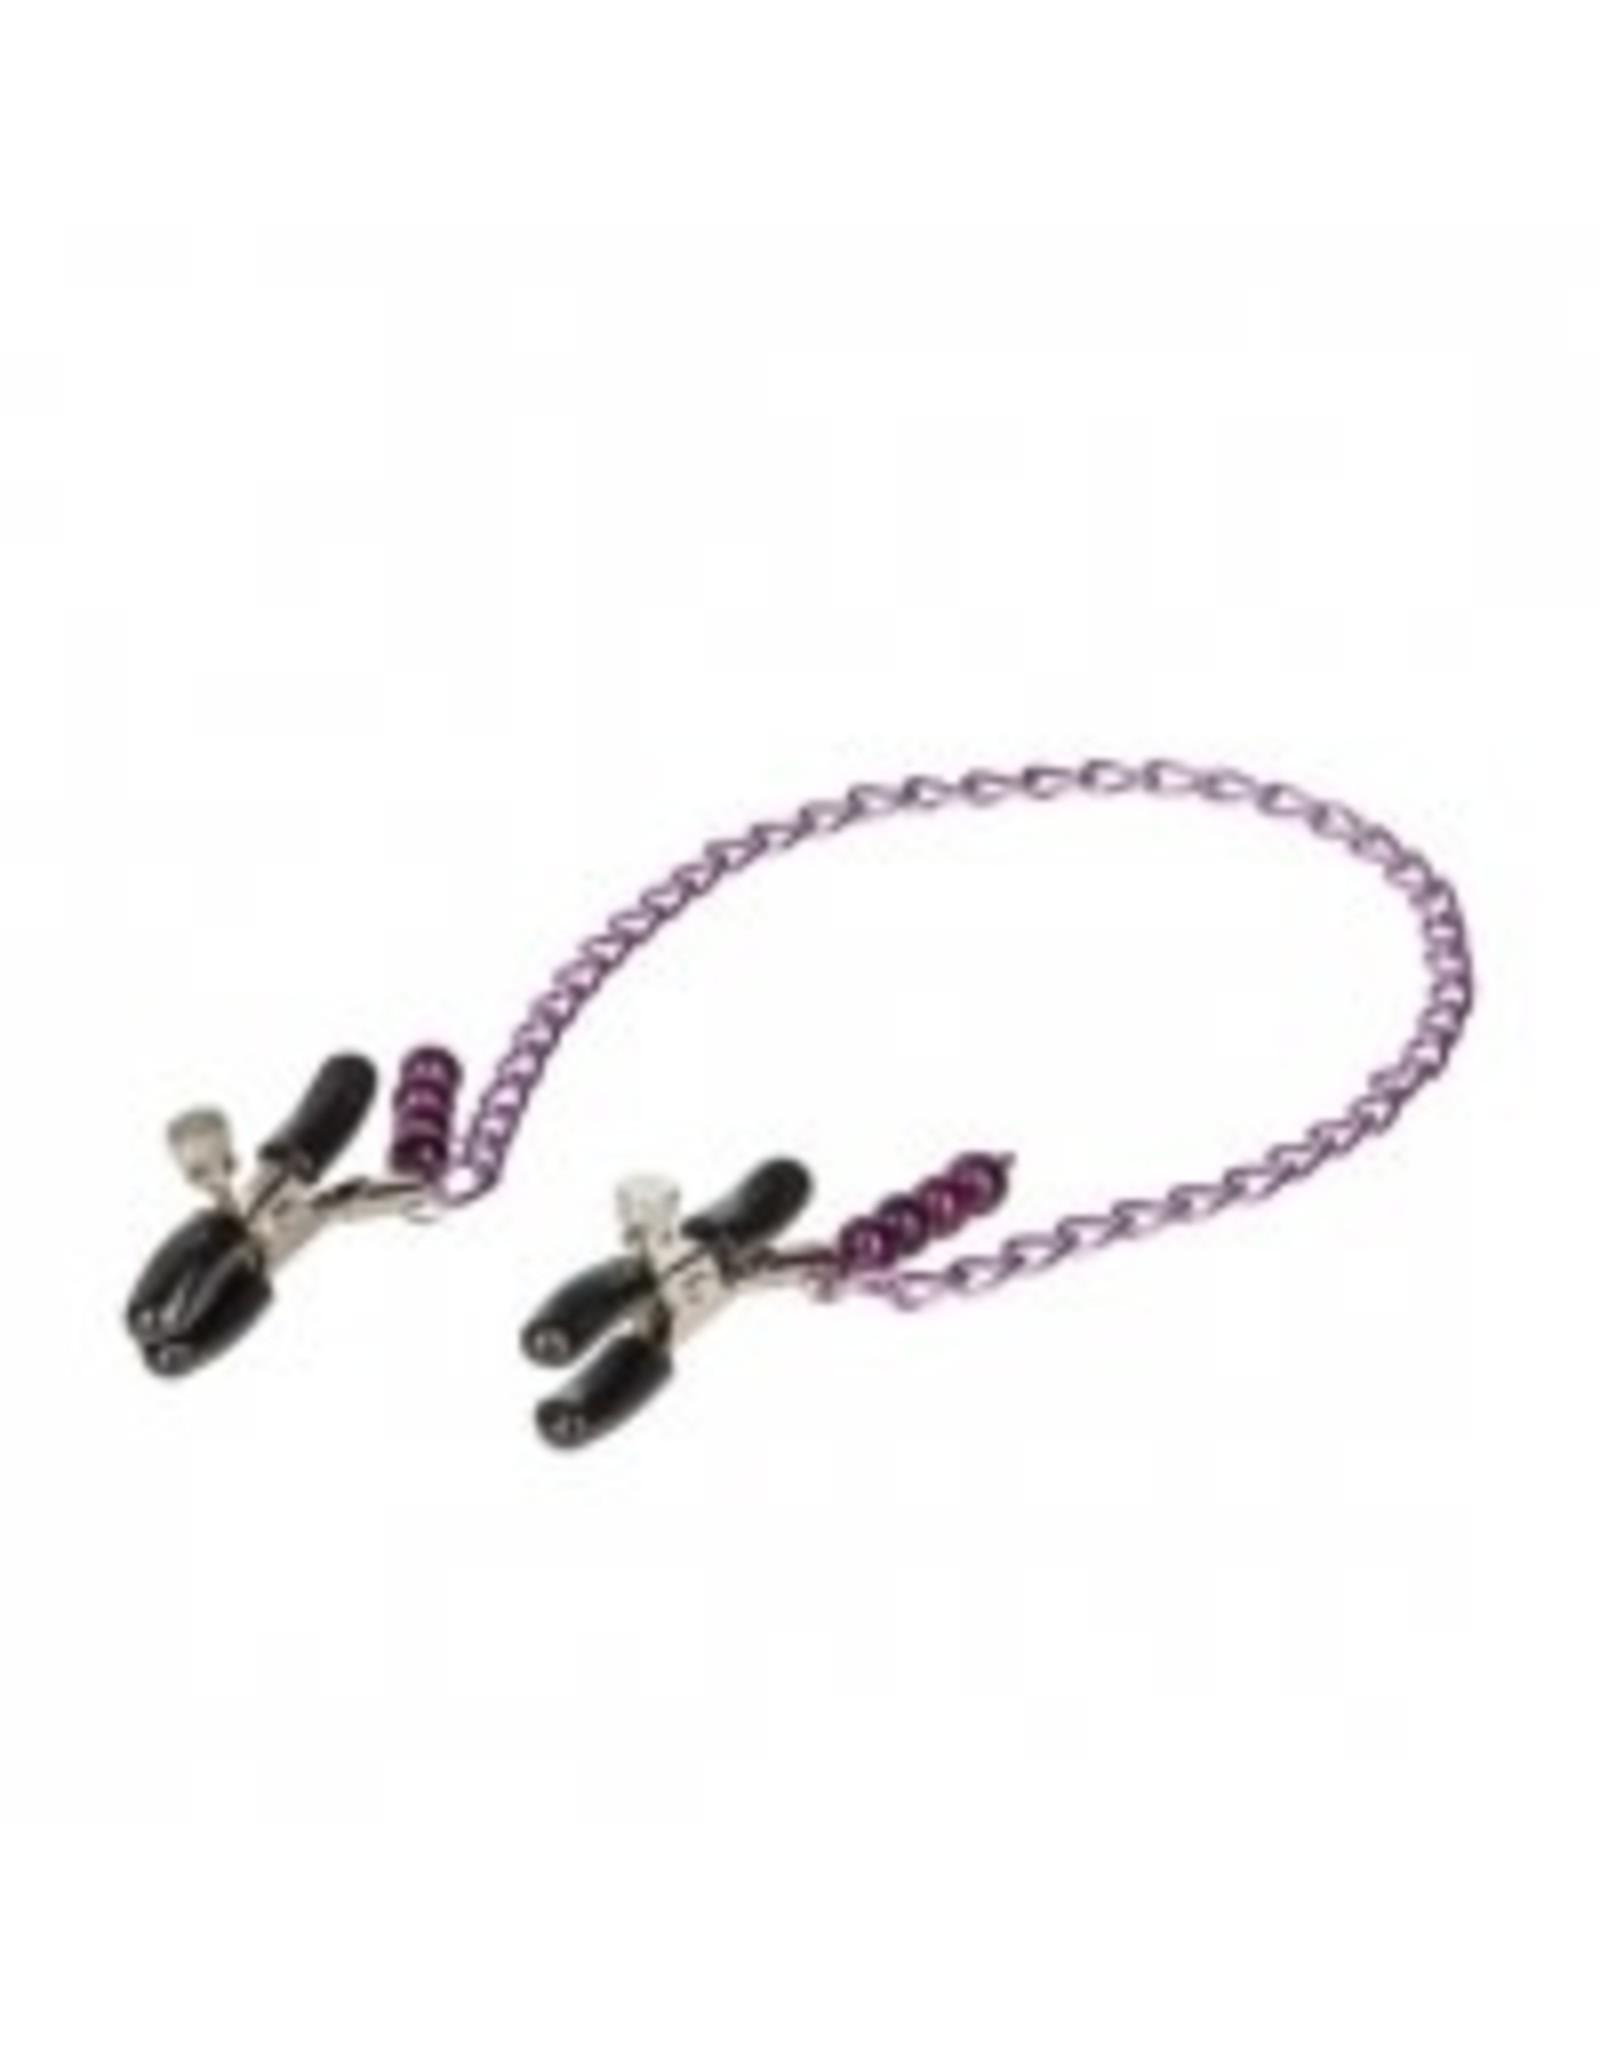 Calexotics Nipple Play - Purple Chain Nipple Clamps